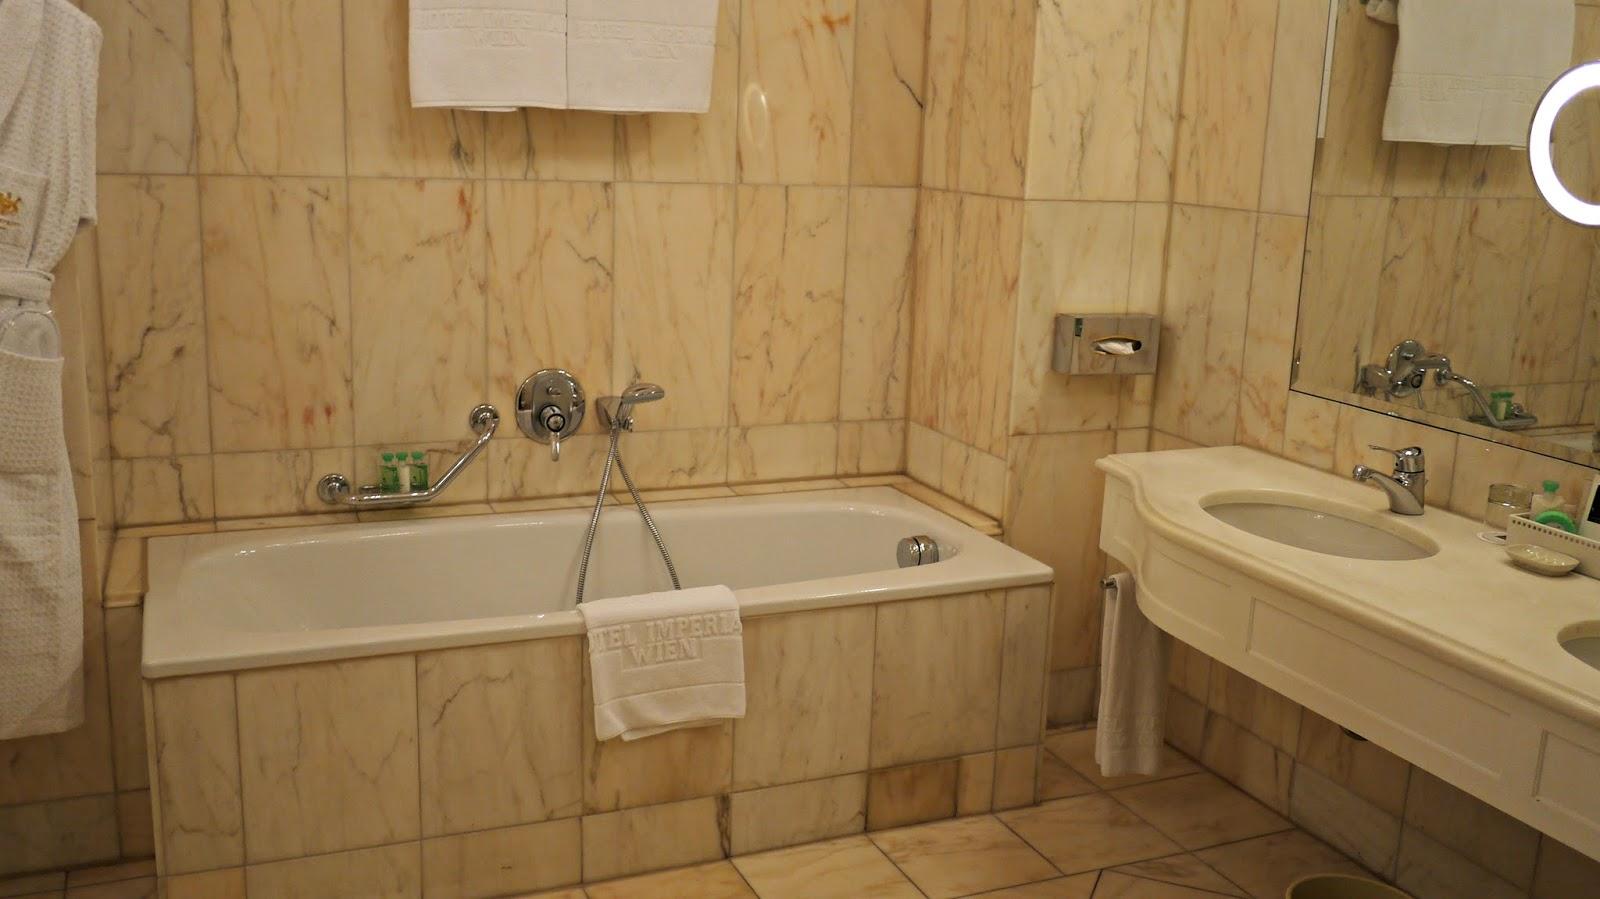 hotel imperial vienna bathroom